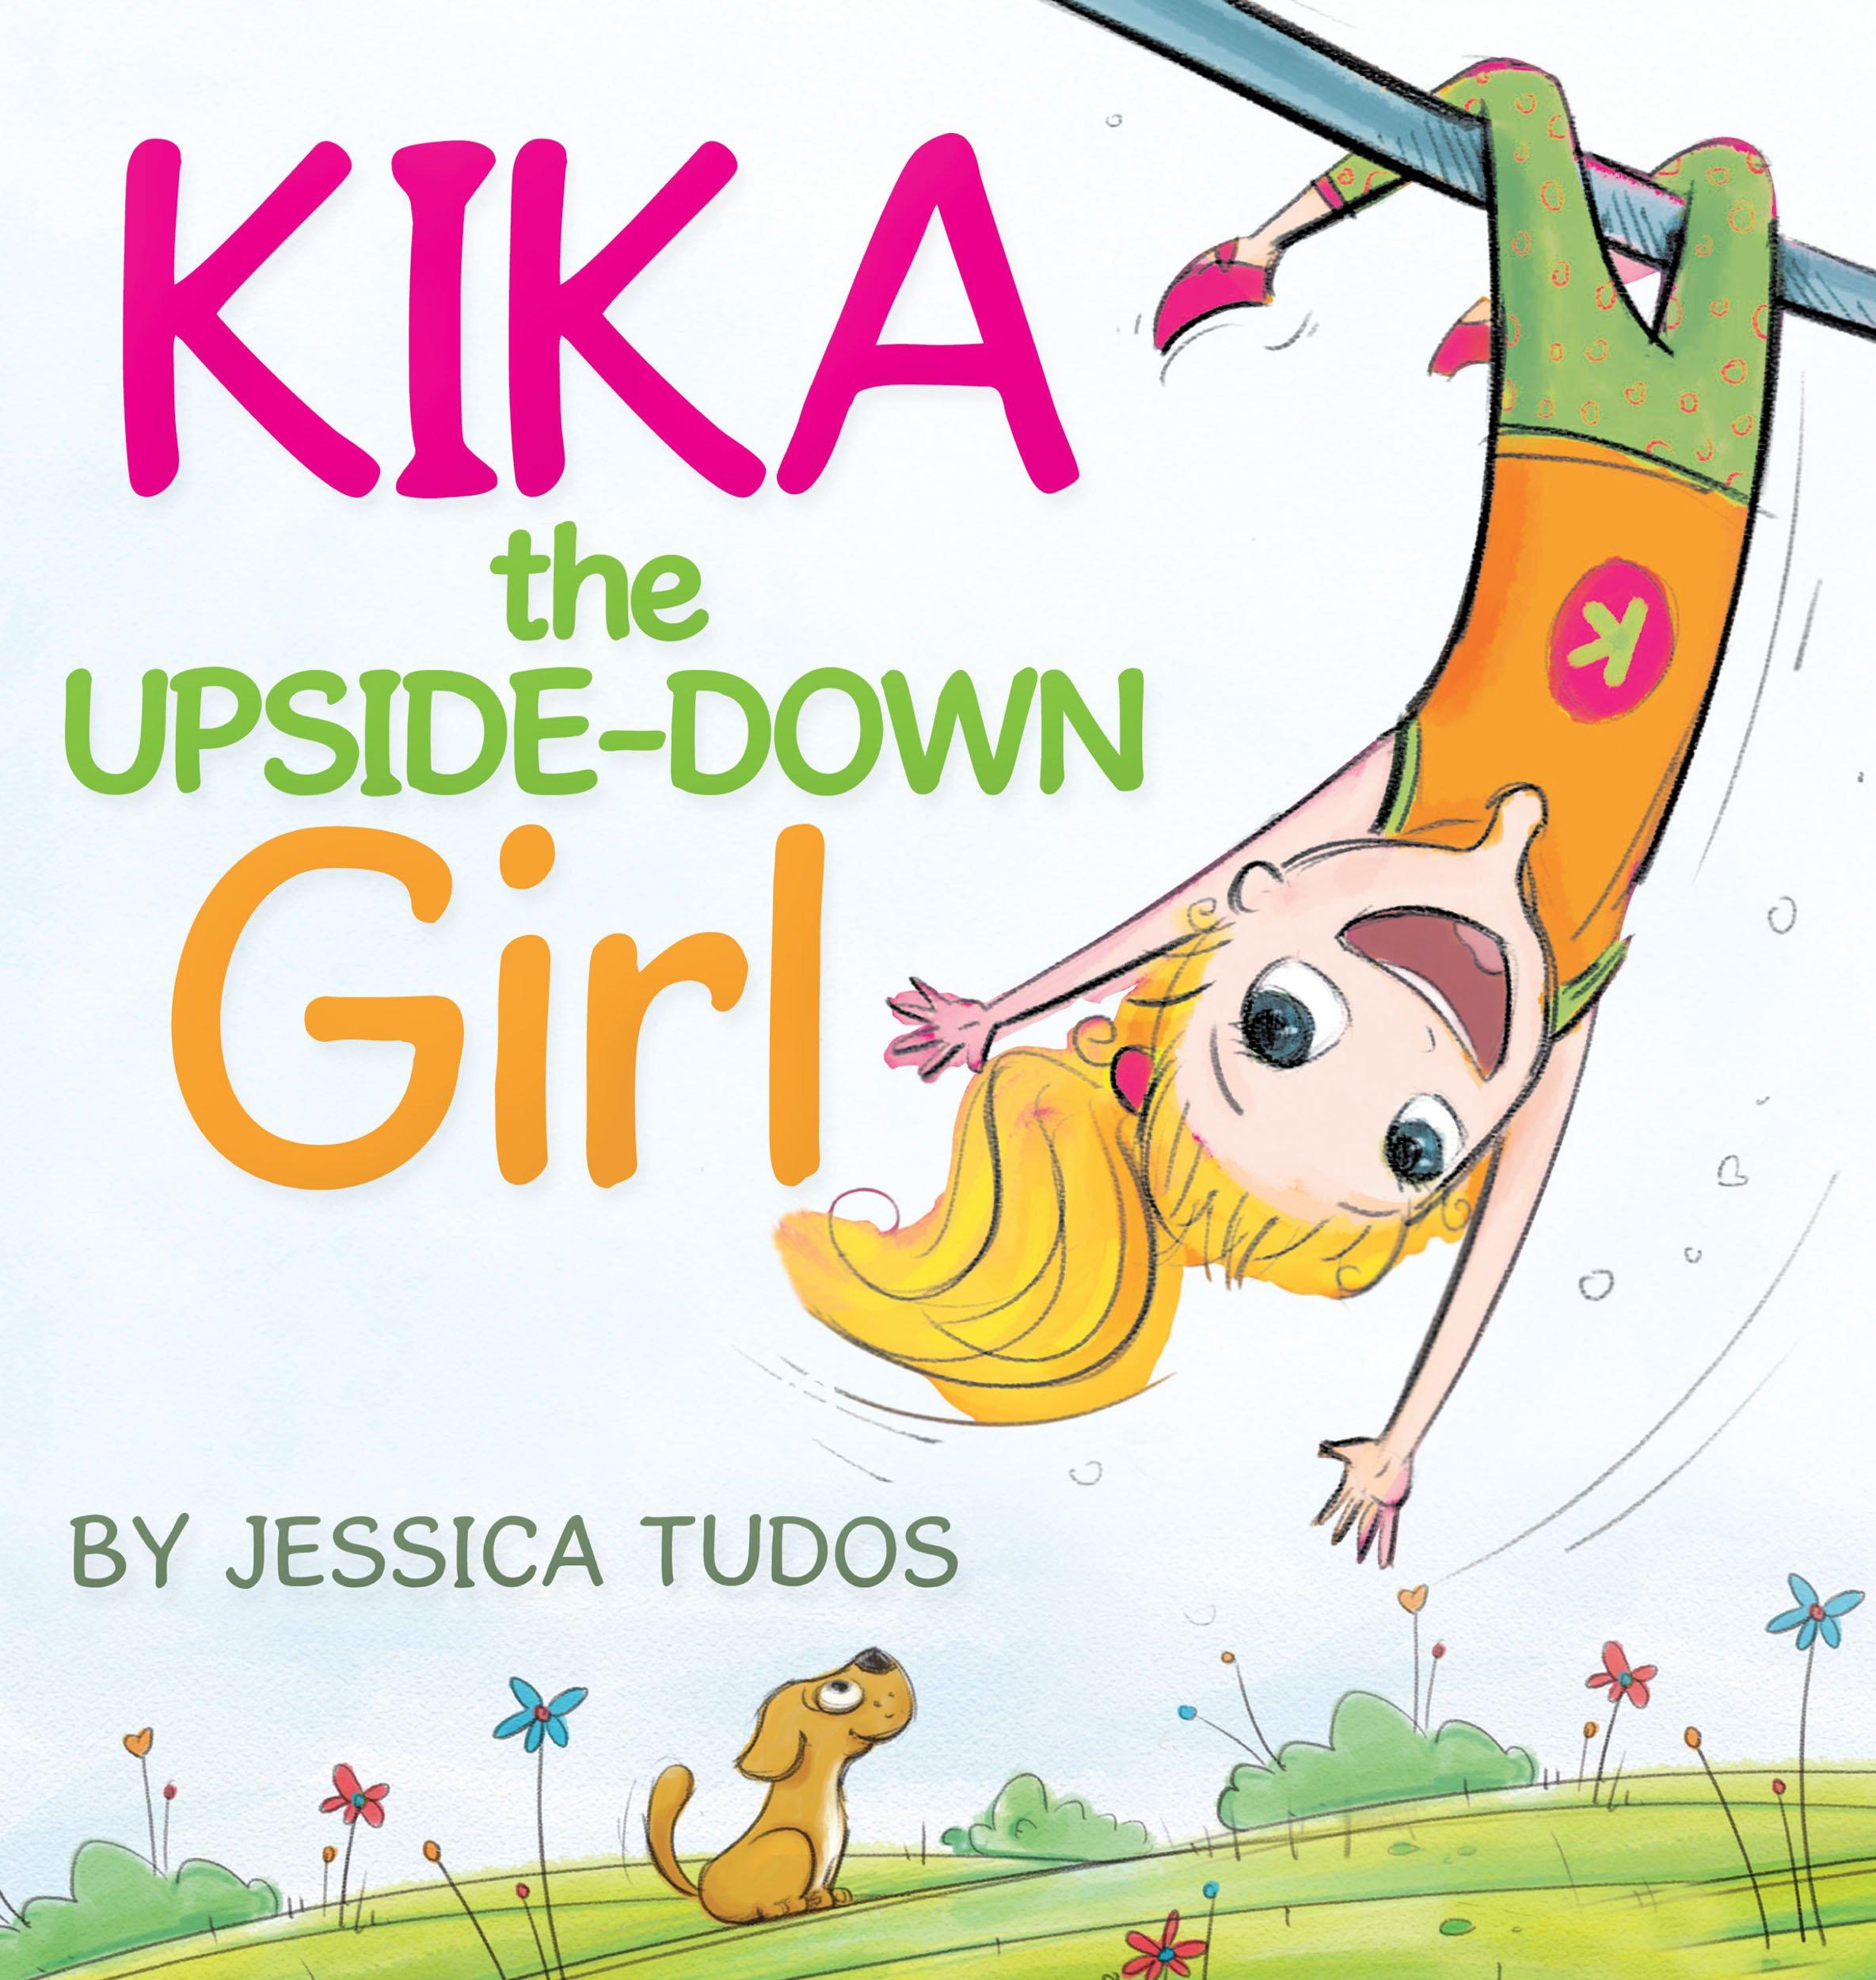 Kika the Upside-Down Girl